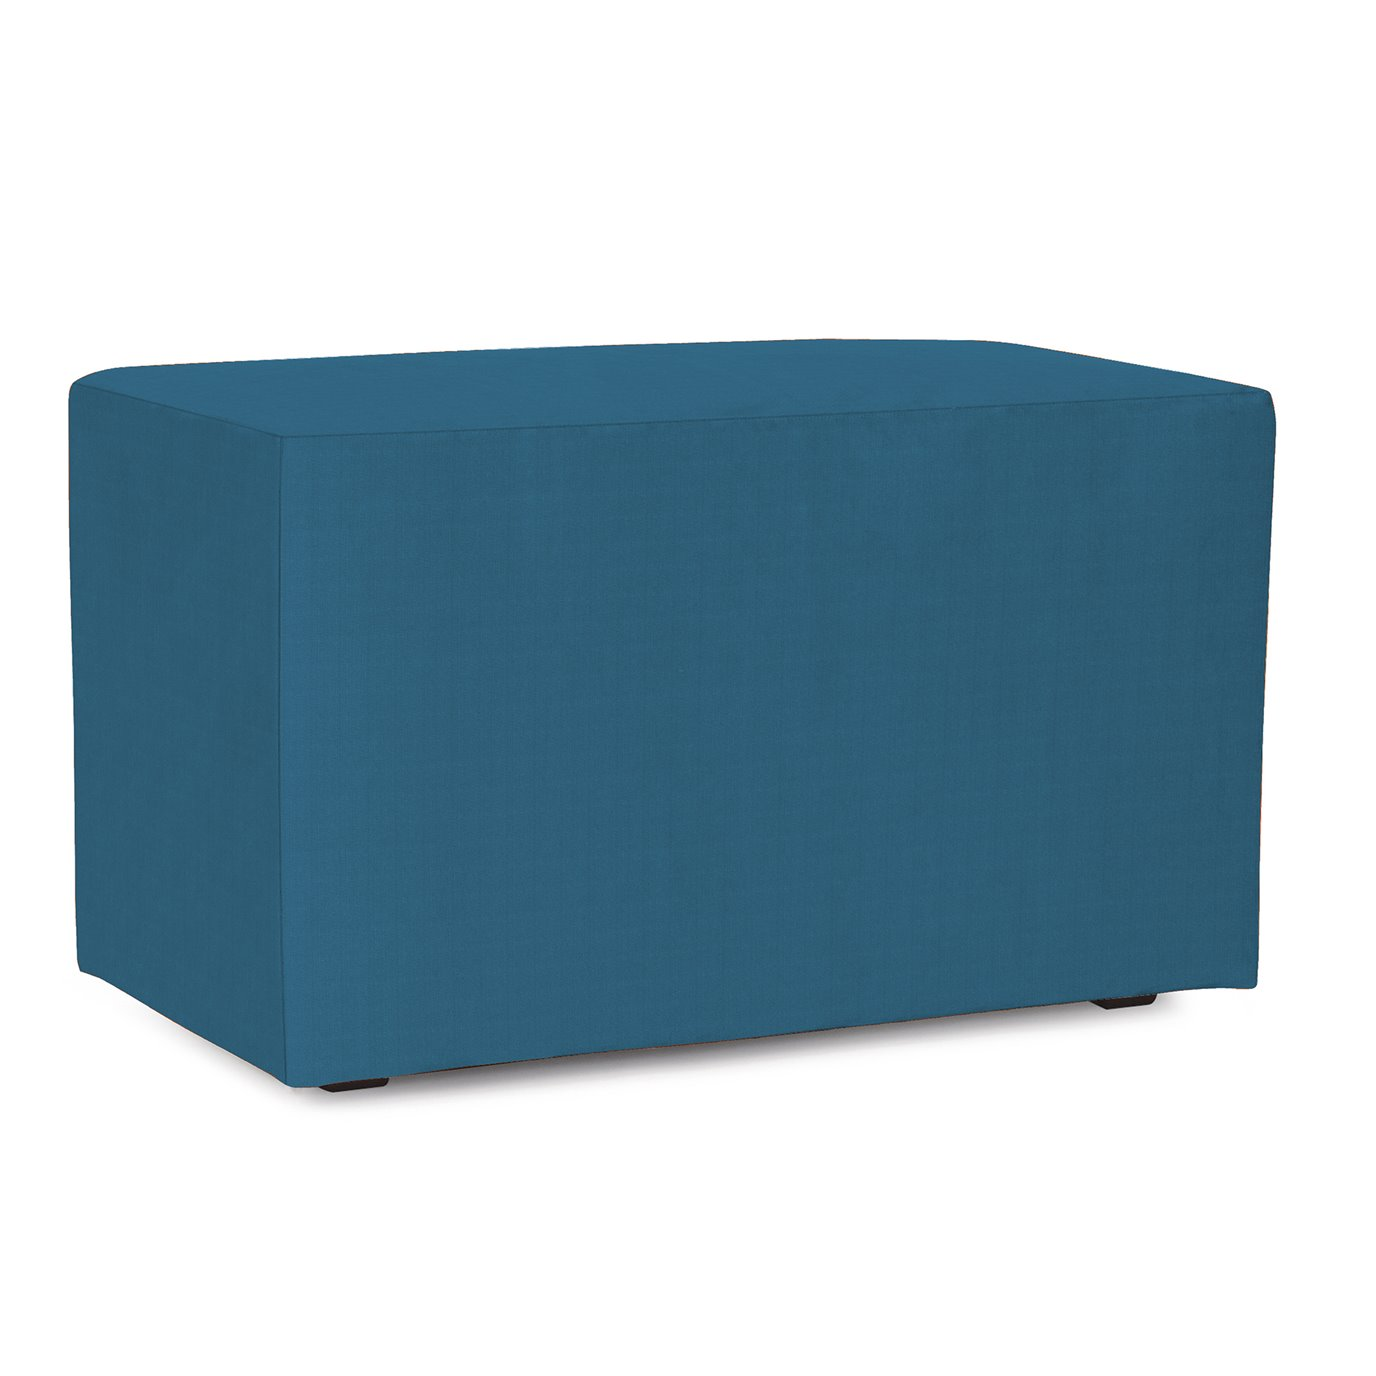 Howard Elliott Universal Bench Outdoor Sunbrella Seascape Turquoise Complete Ottoman